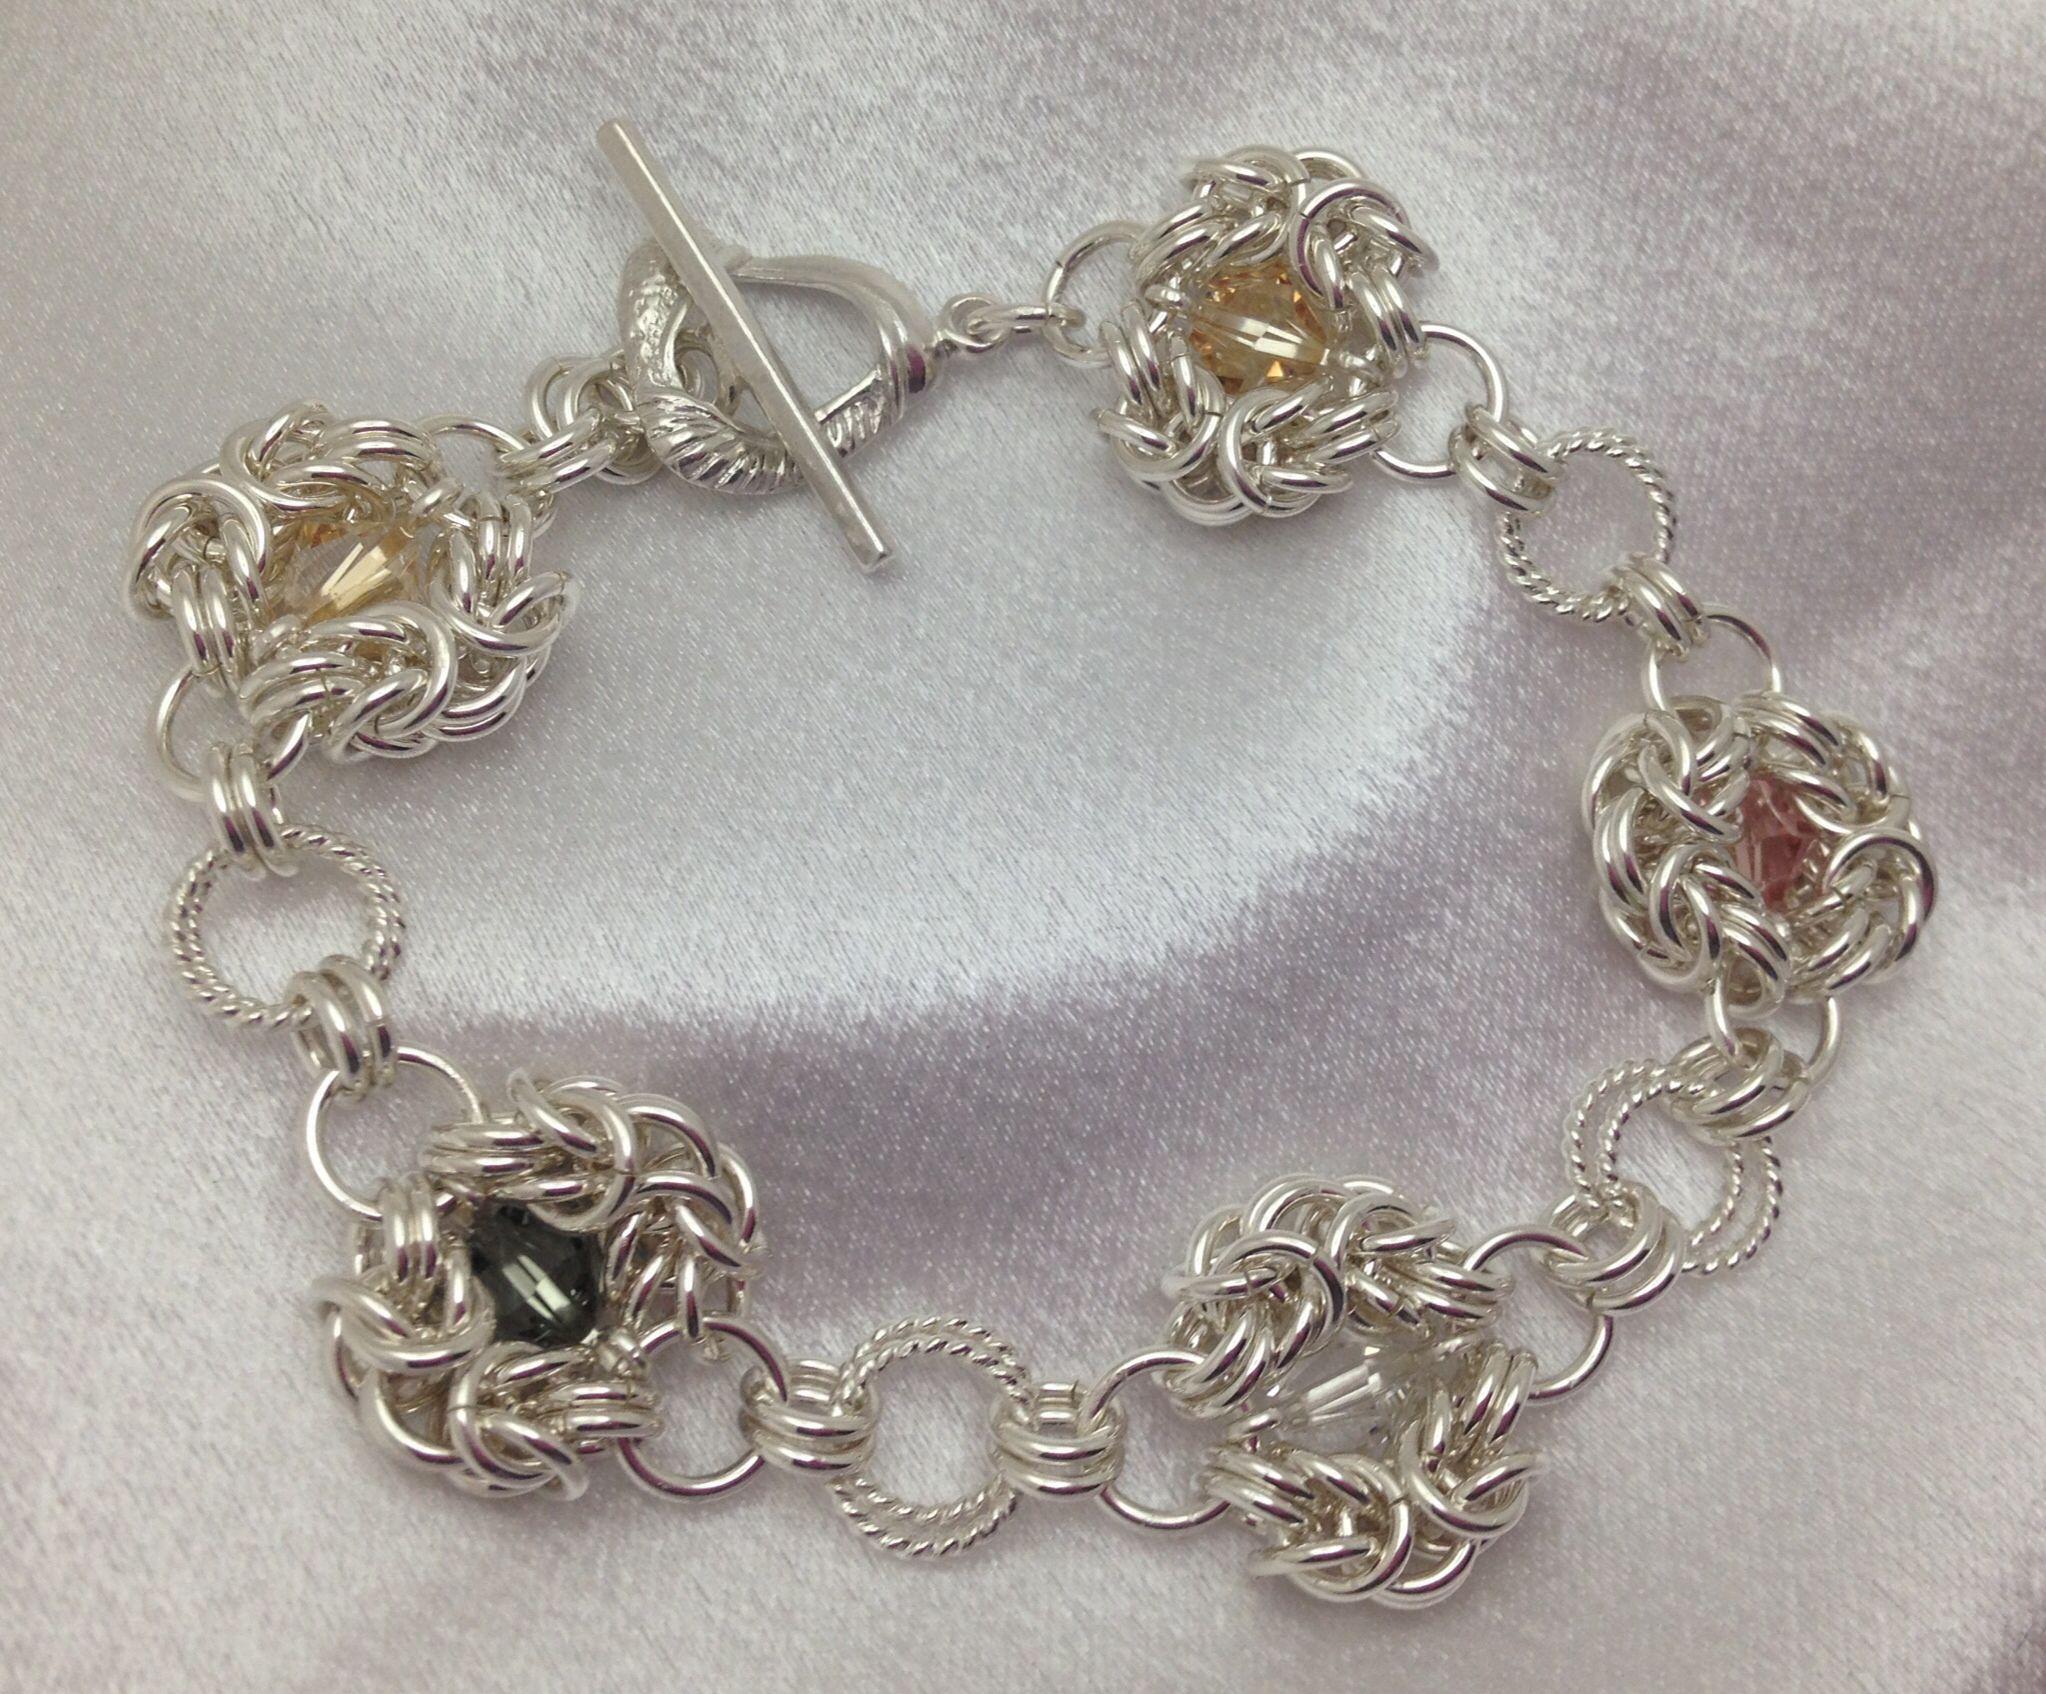 Sterling silver Romanov florets with Swarovski crystals bracelet.  www.Facebook.com/WireCrossing